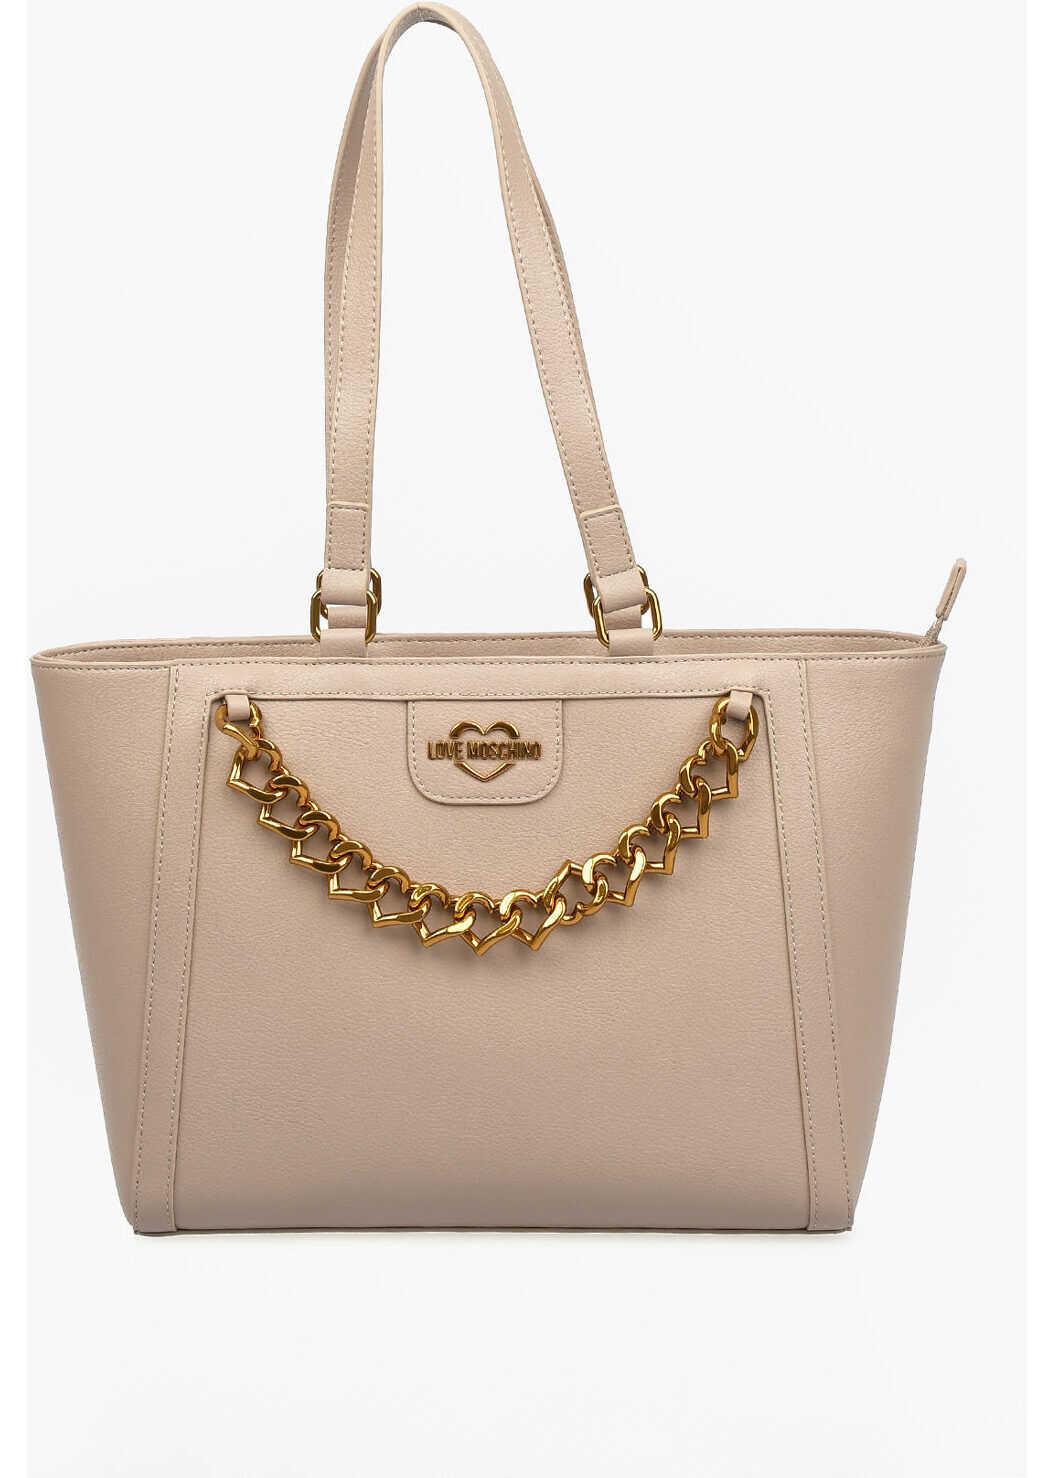 Moschino LOVE Faux Leather NEW CHAIN HEART Tote Bag BEIGE imagine b-mall.ro